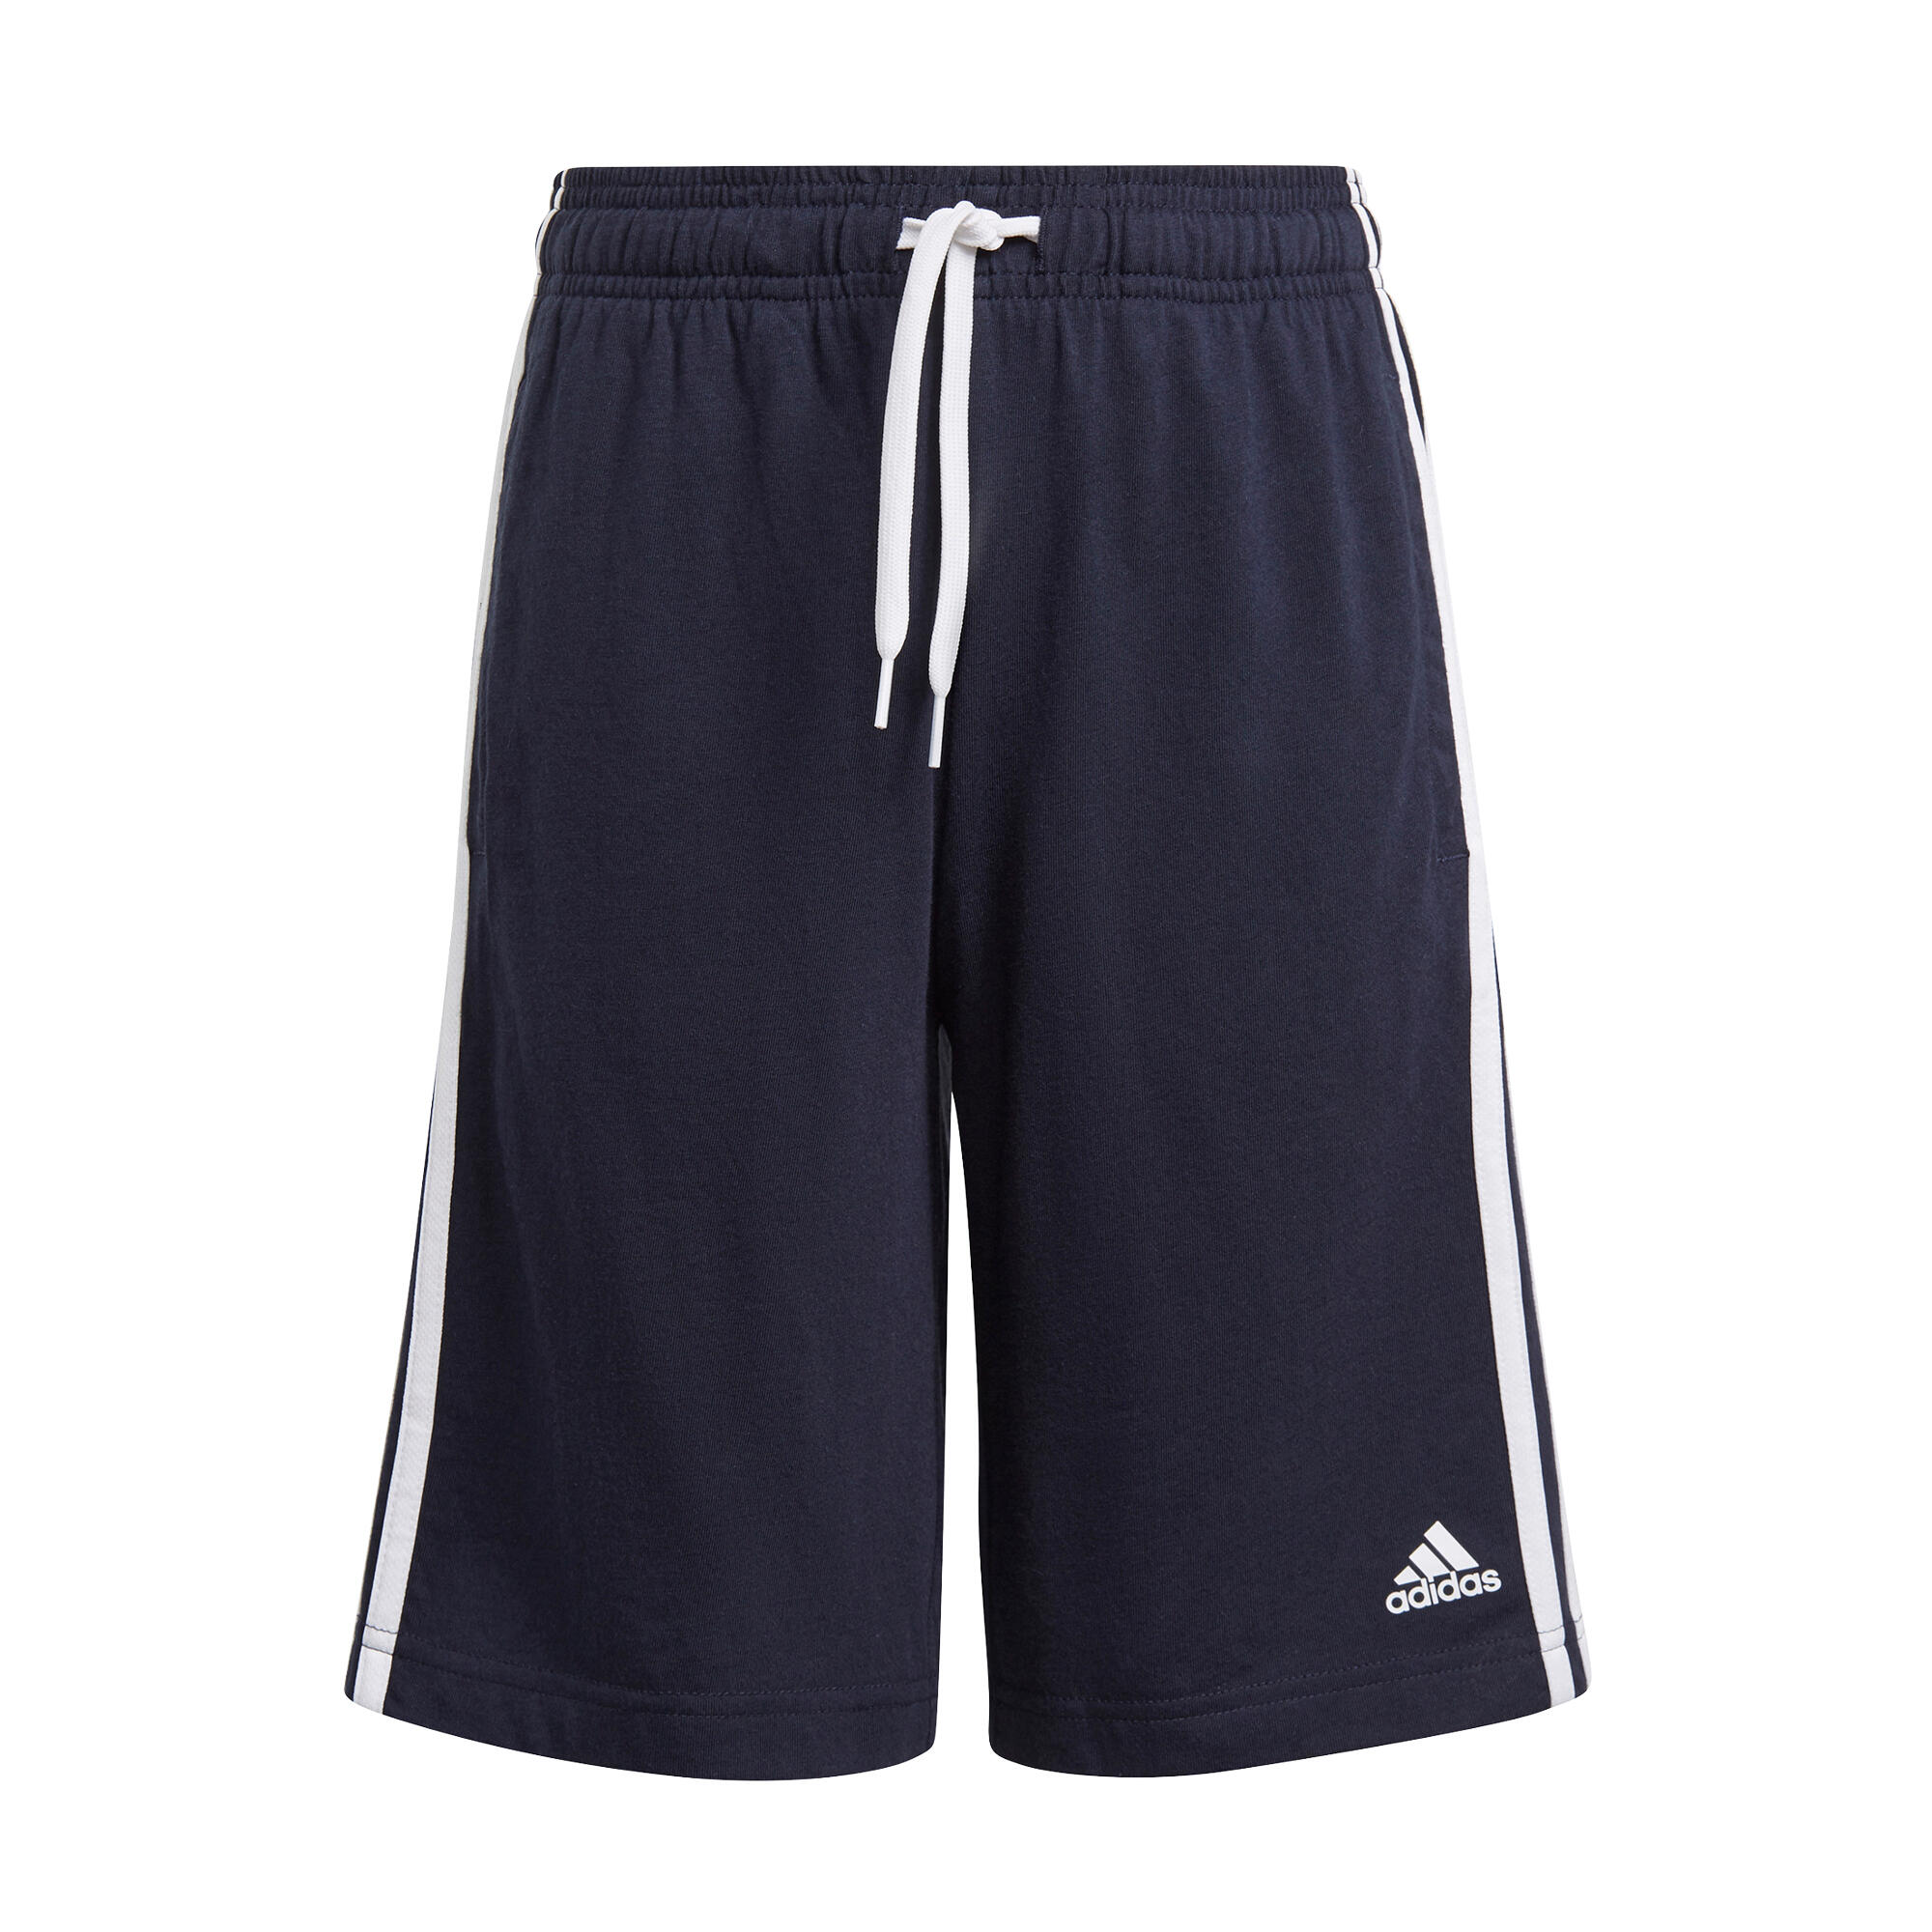 Şort Adidas băieți imagine